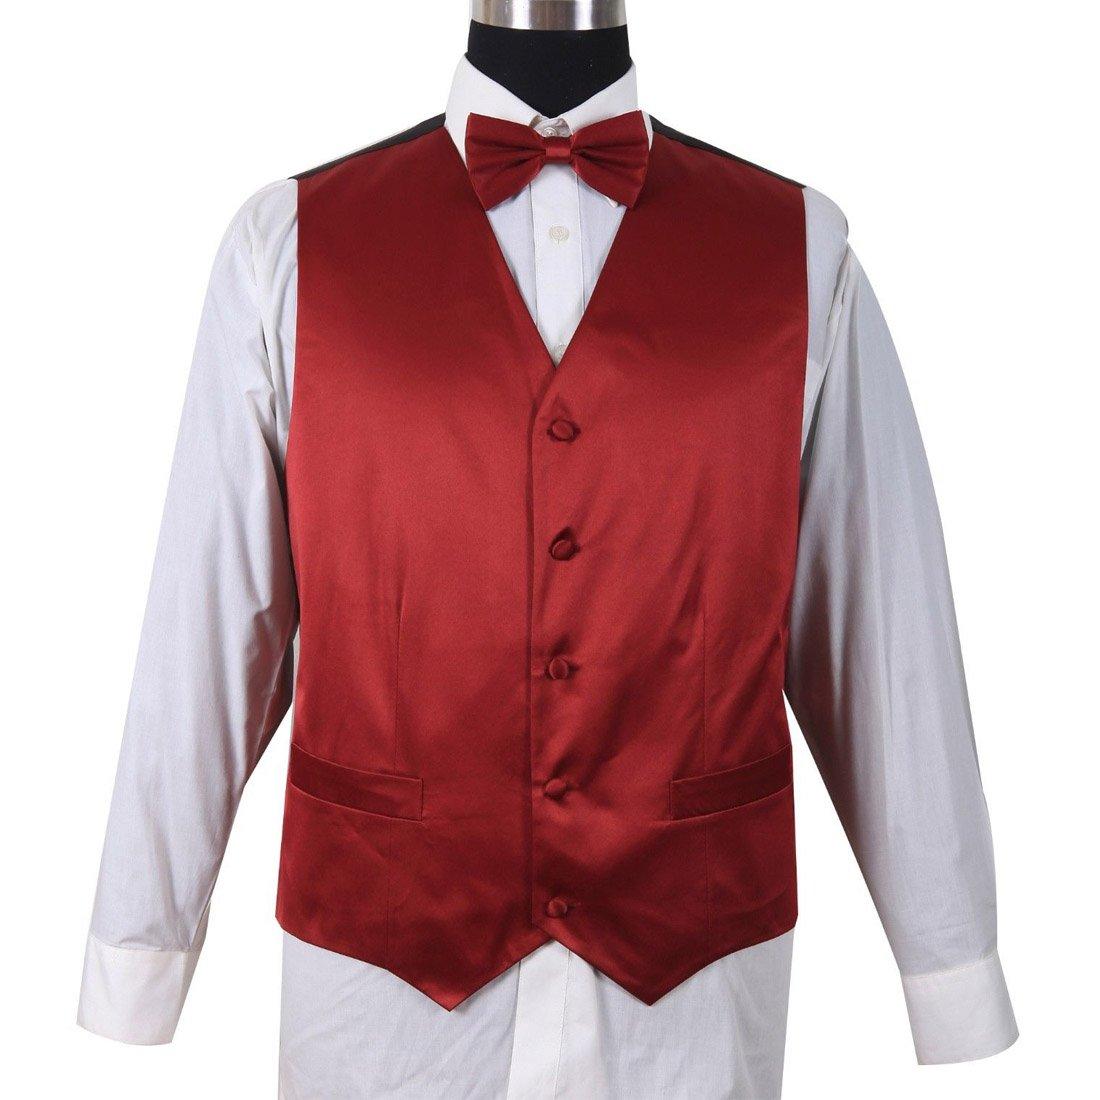 Milano Moda mens Premier Cotton Fabric Vest Sets HLV004 New York Brand